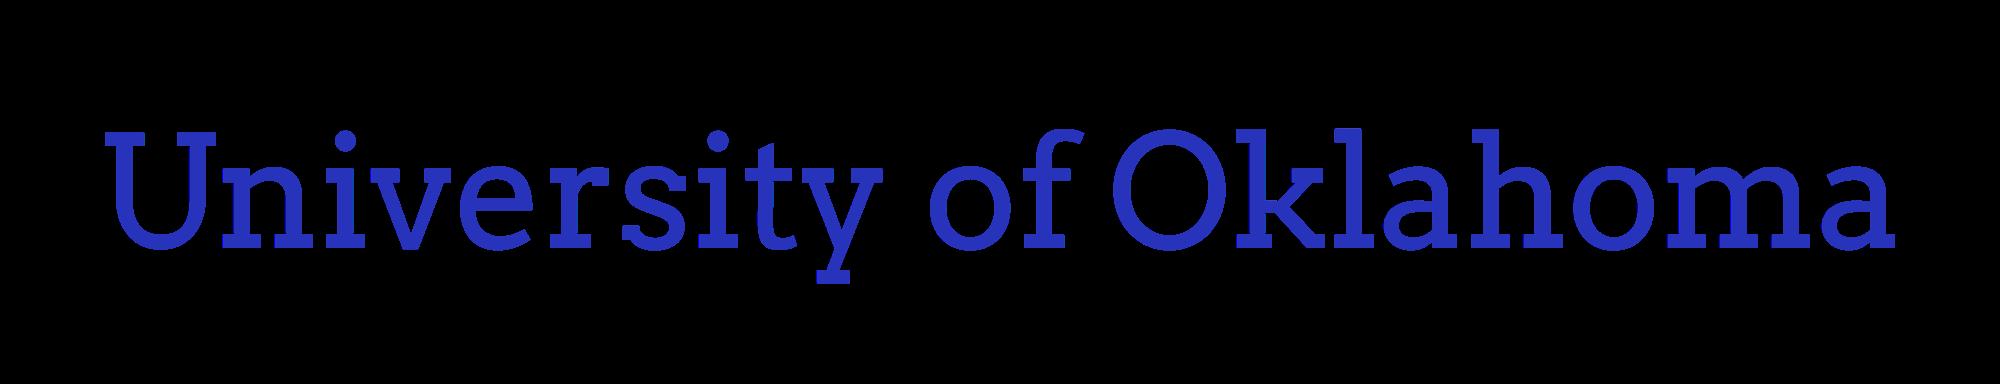 University of Oklahoma-logo.png